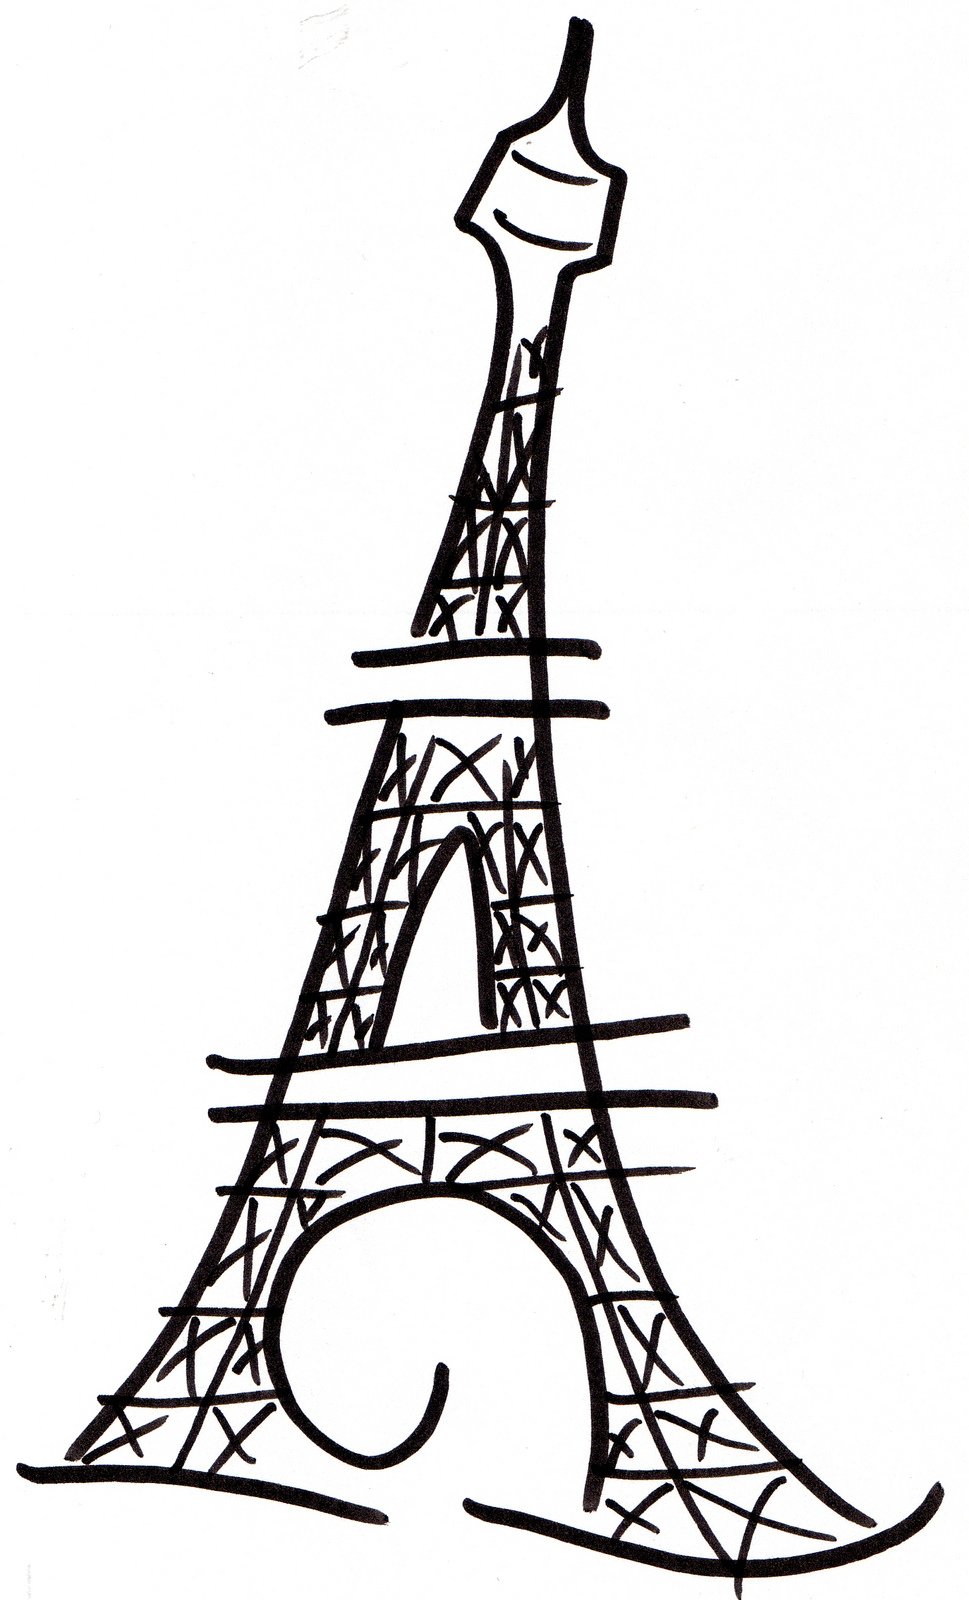 969x1600 Eiffel Tower Silhouette Clipart Free Stock Photo Public Domain 2